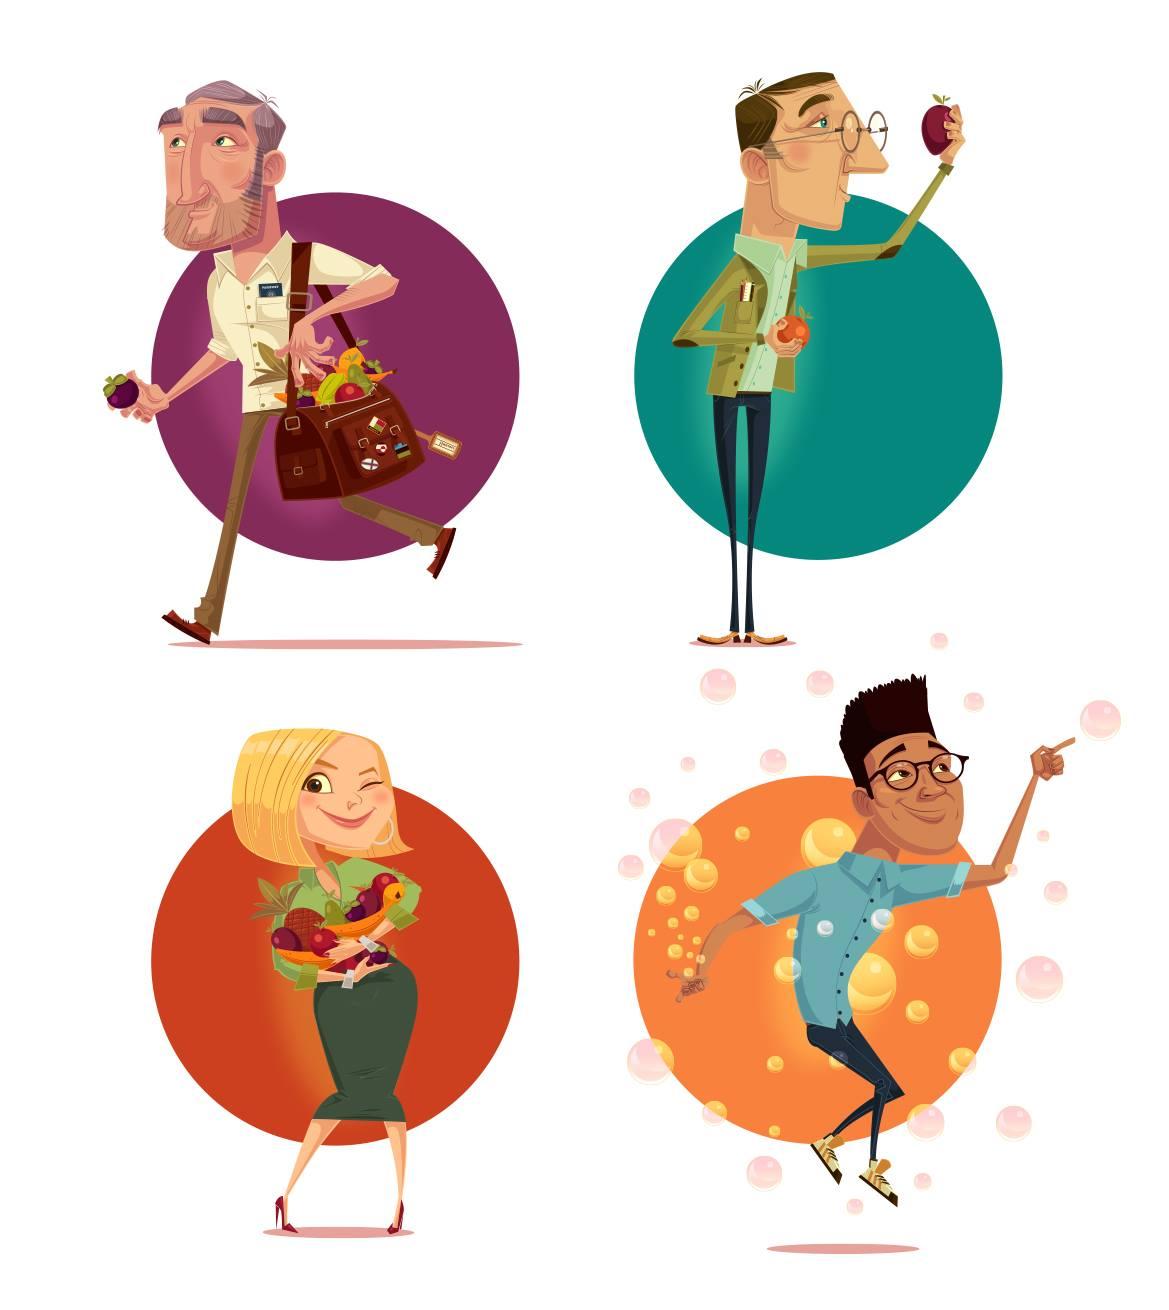 ilustraciones James Gilleard personajes